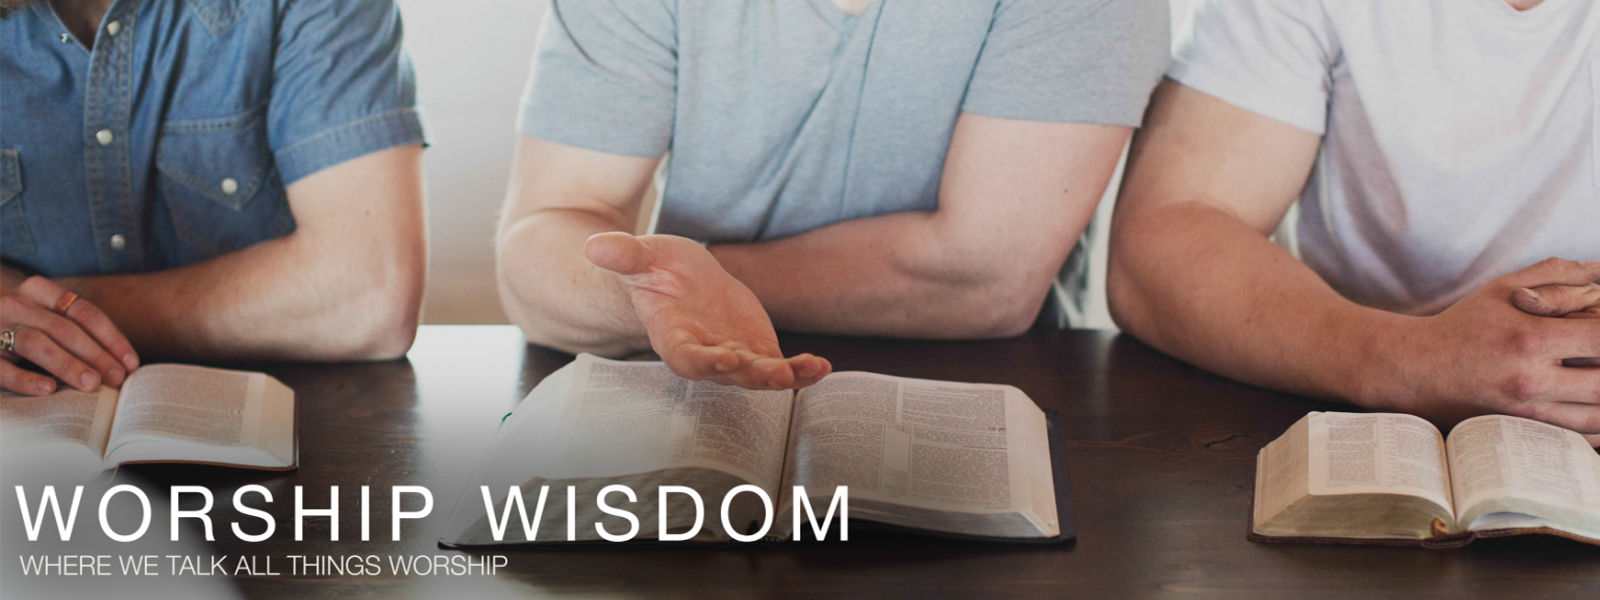 Worship Wisdom